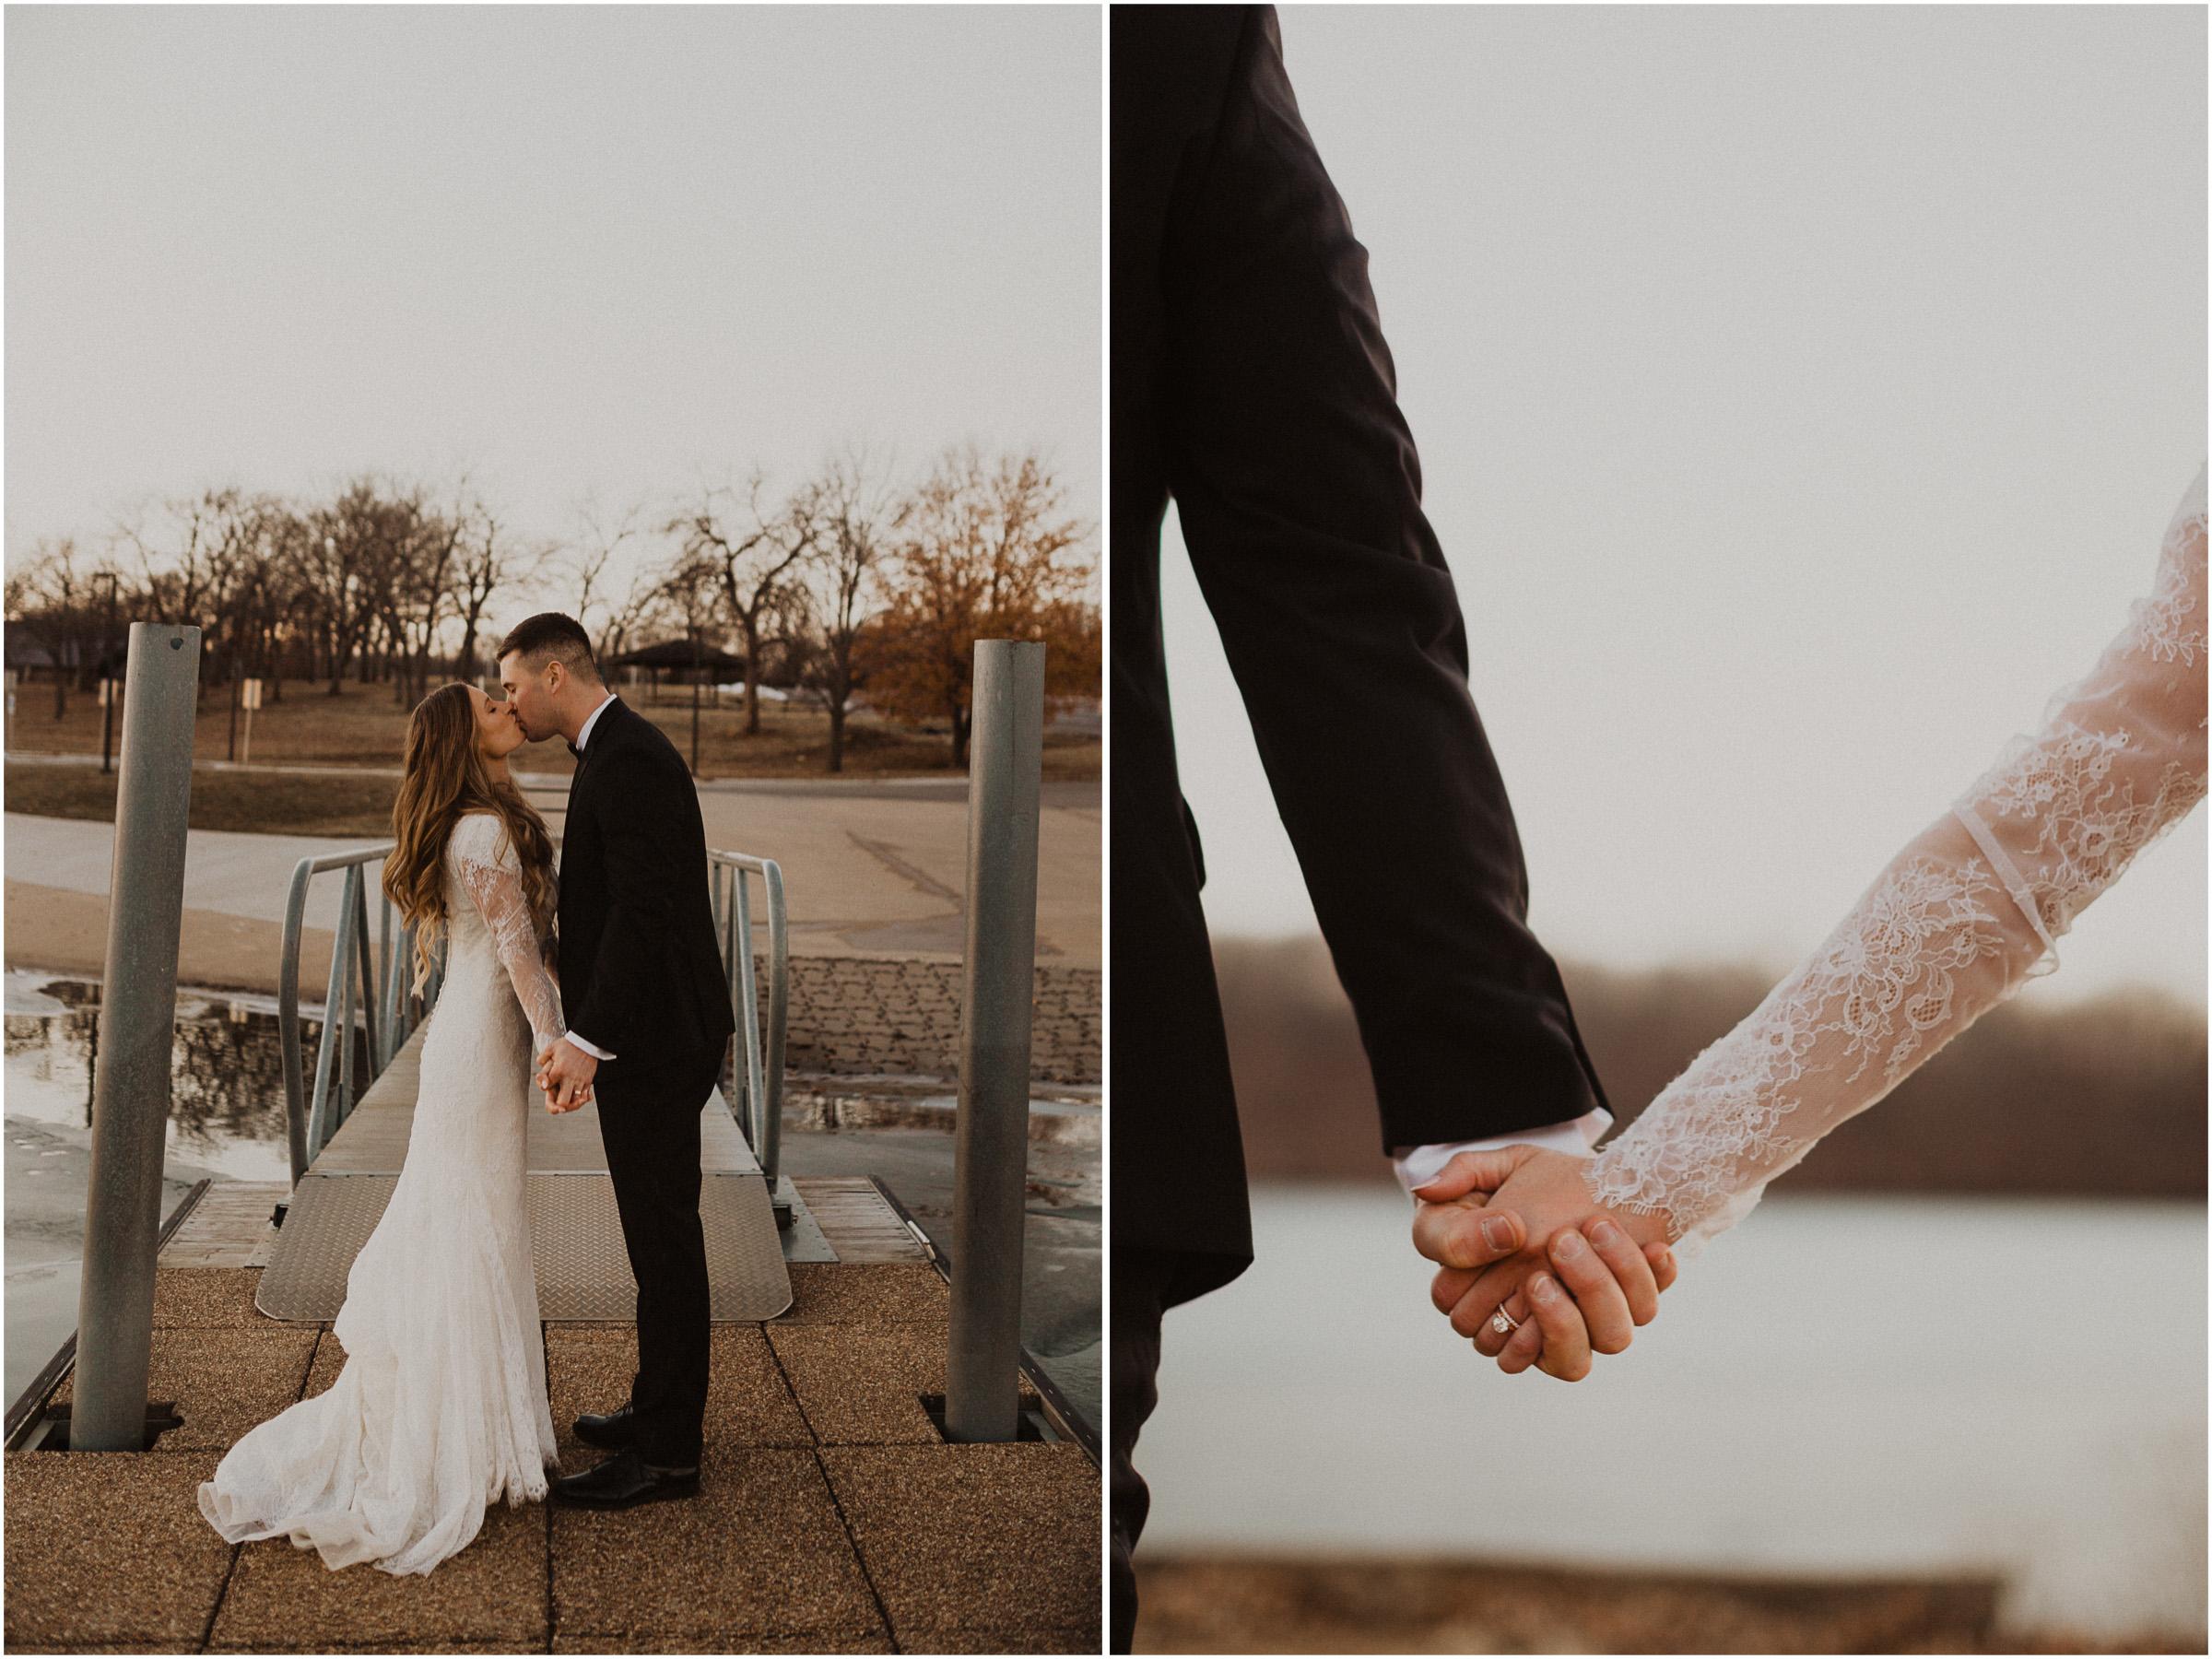 alyssa barletter photography shawnee mission park winter wedding 8th and main grandview missouri photographer-24.jpg